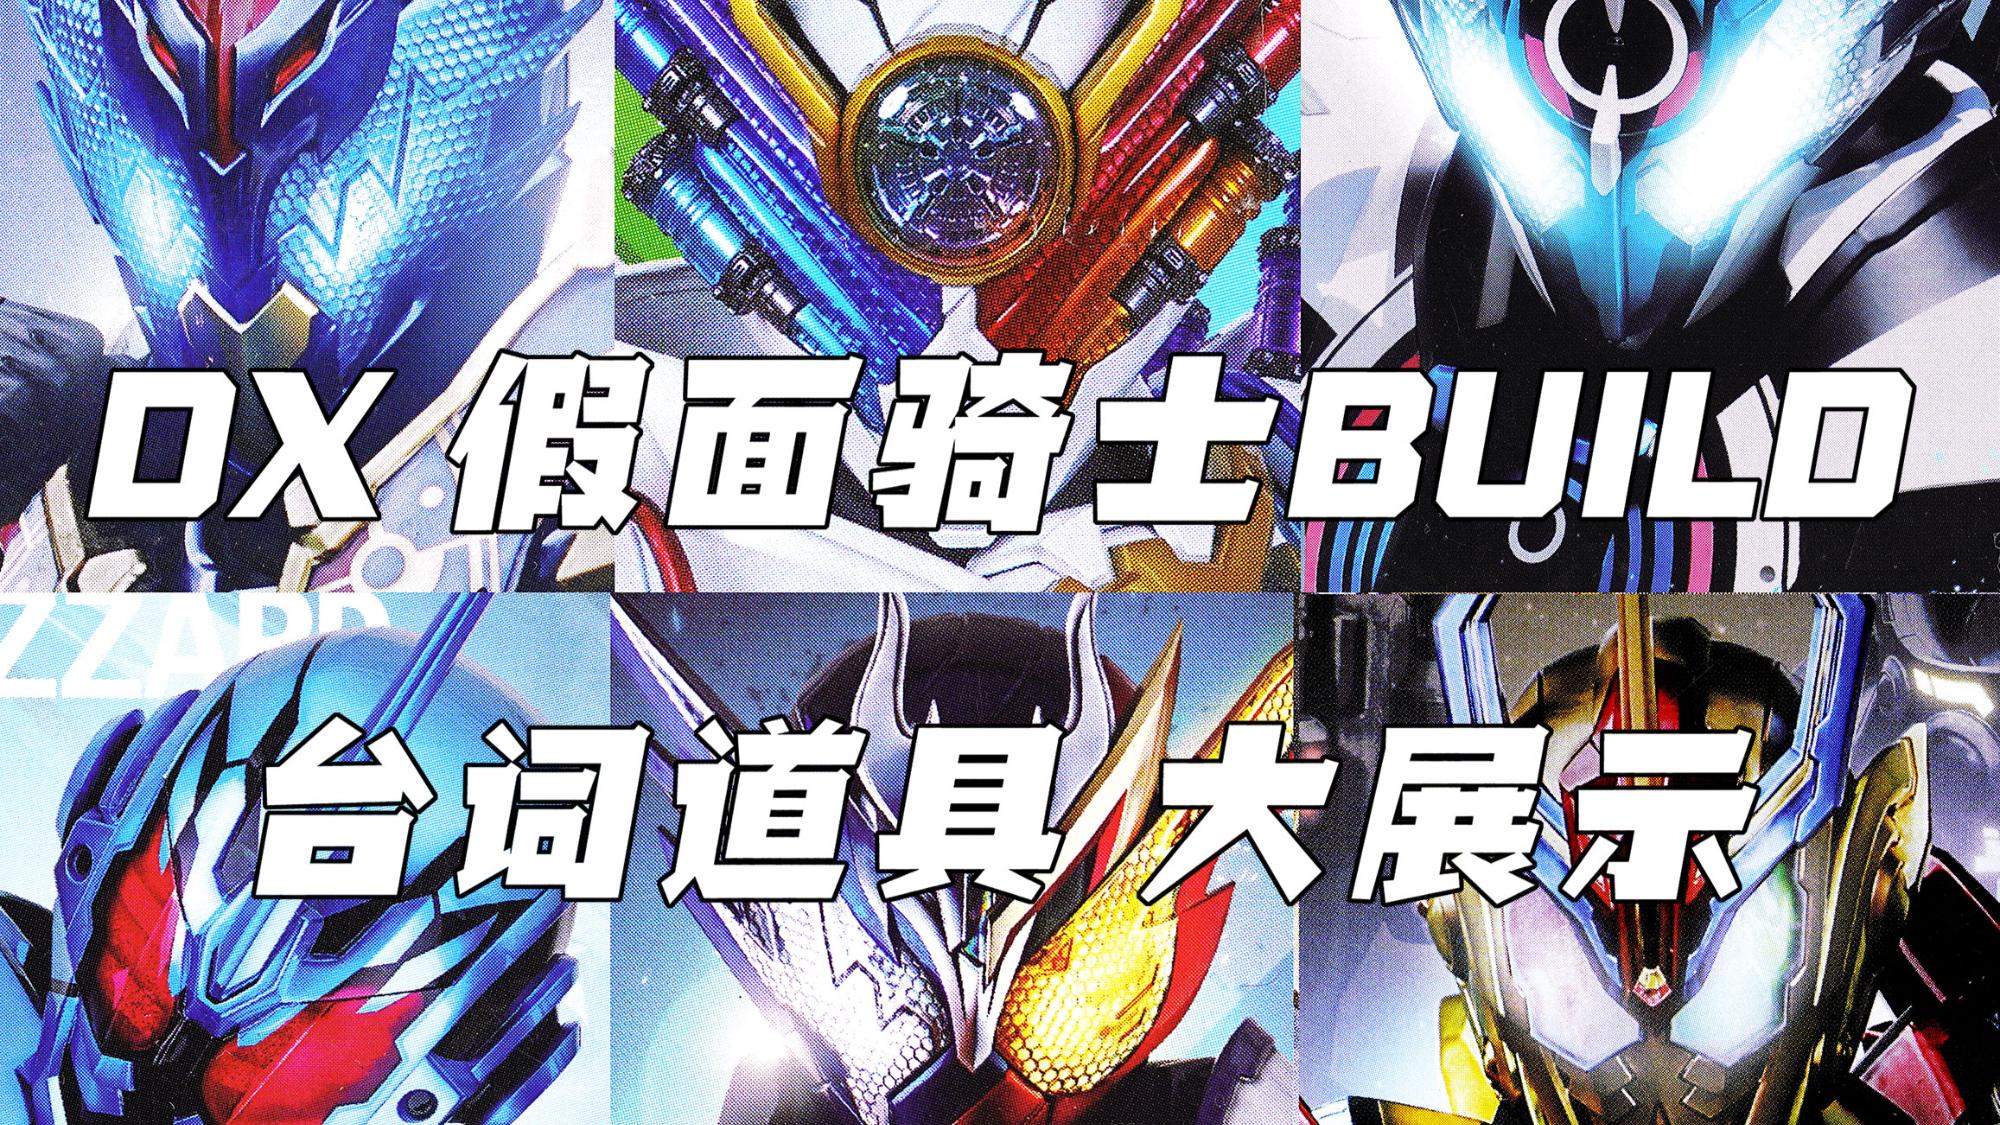 DX 假面骑士BUILD 台词道具 大展示